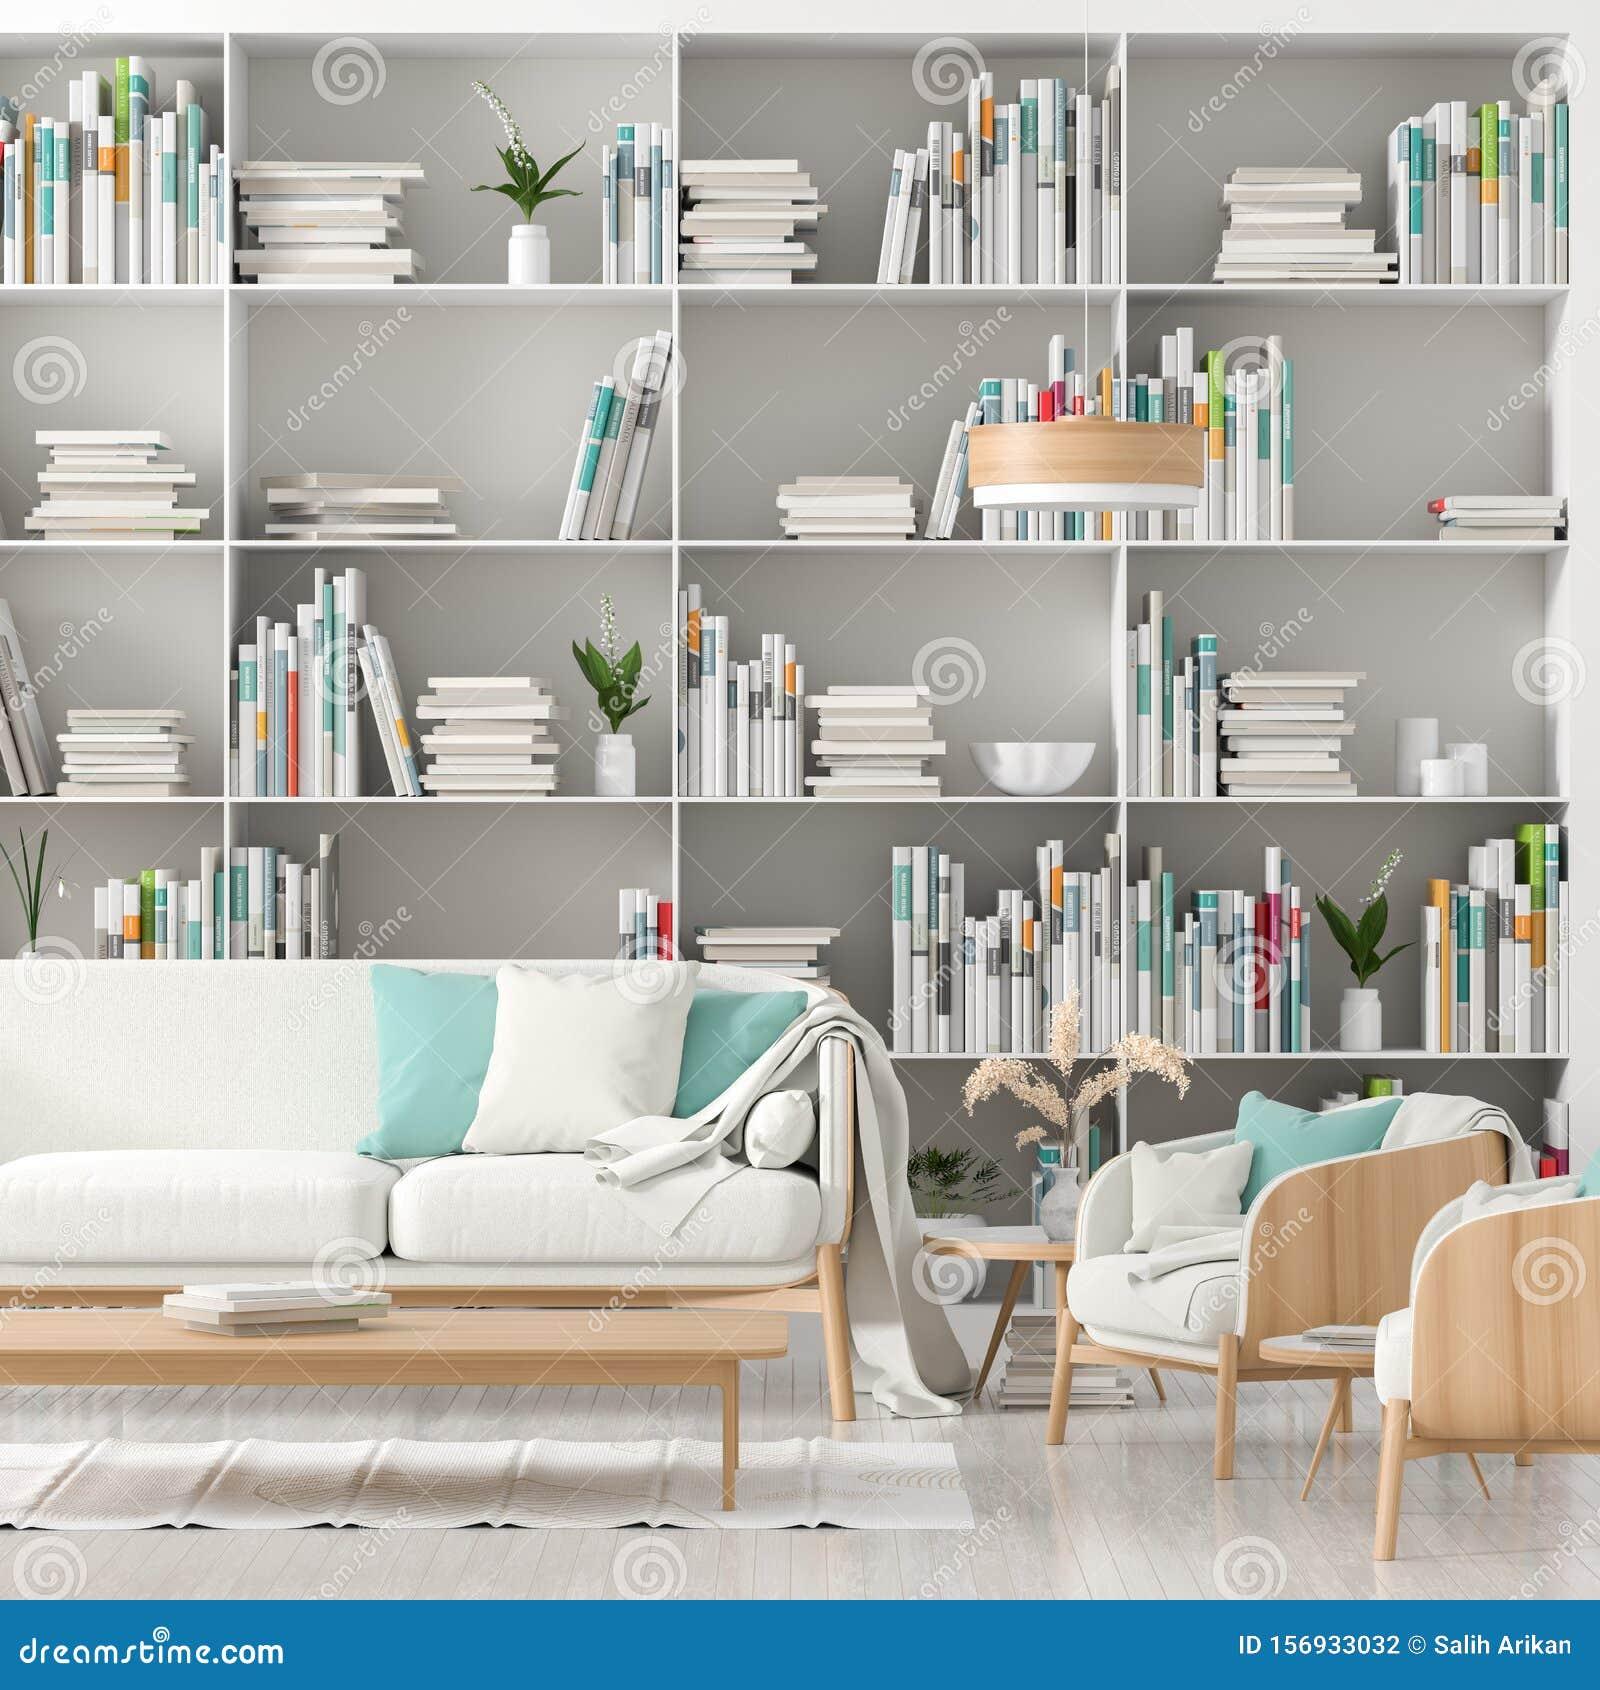 Modern Scandinavian Style Interior With Book Shelf Full Of Books Minimalist Interior Design 3d Illustration Stock Illustration Illustration Of Scandinavian Elegant 156933032